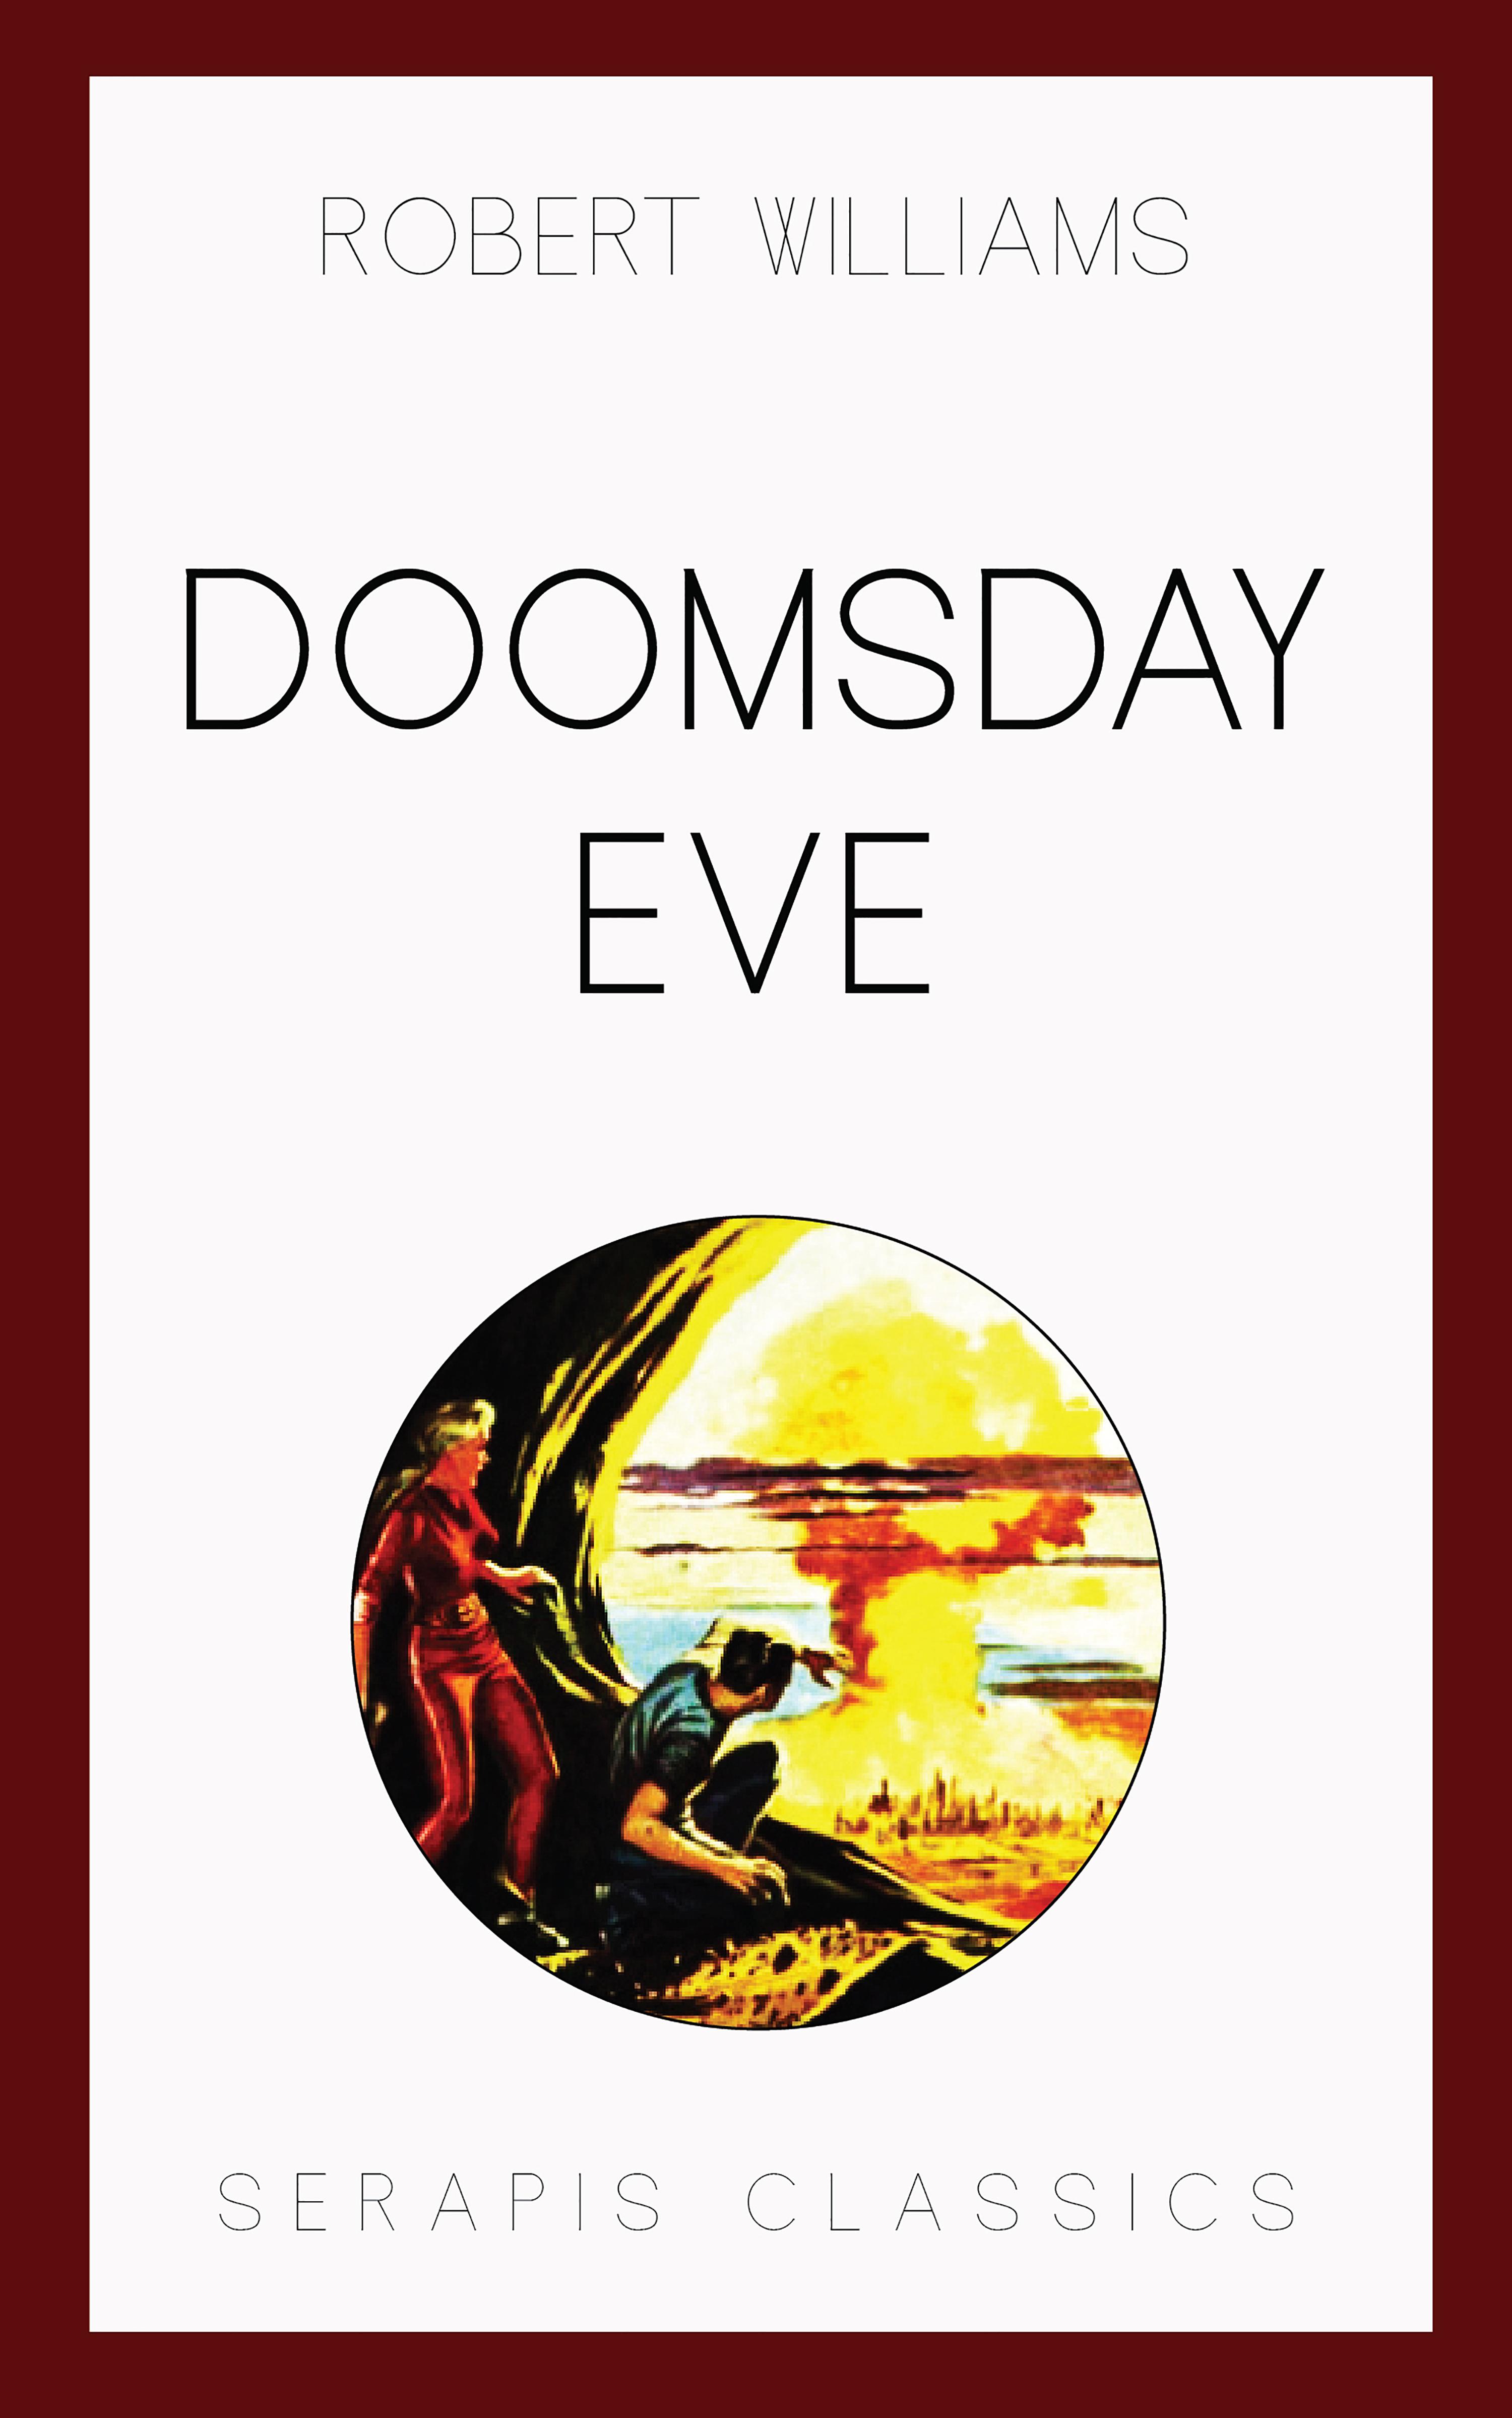 Robert Williams Doomsday Eve